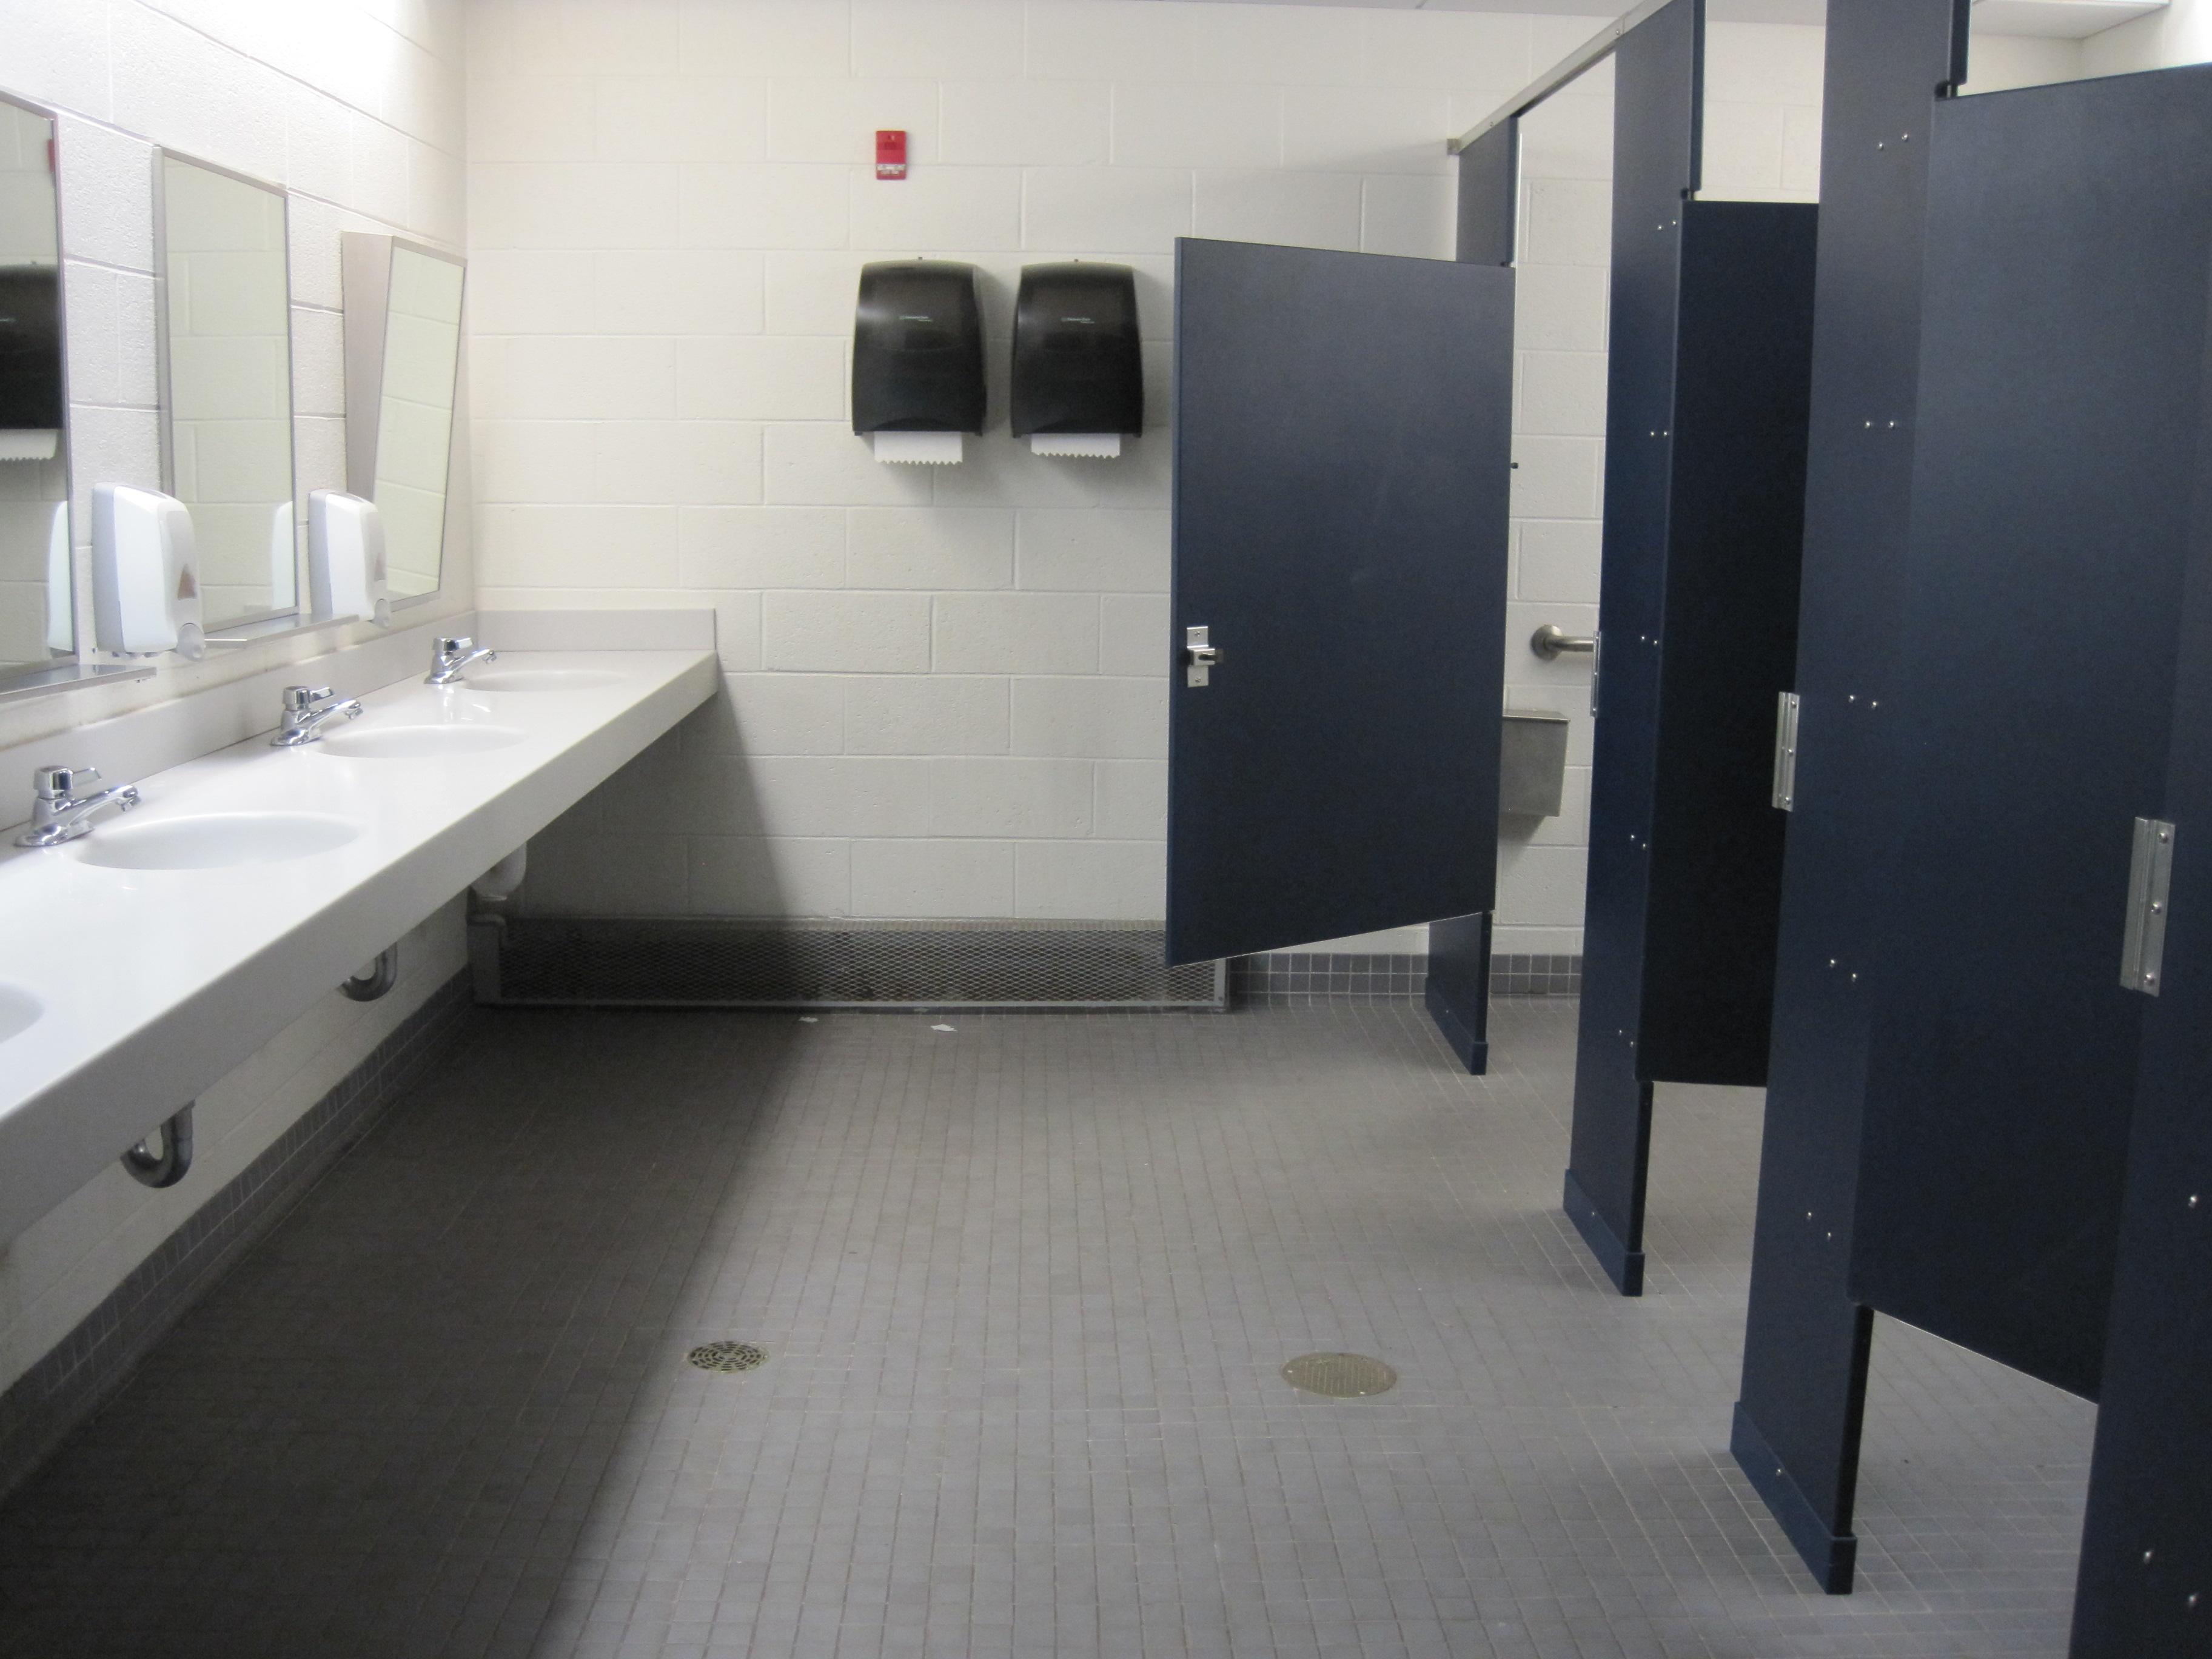 middle school bathroom. Beautiful Bathroom Cleanliness 5 To Middle School Bathroom H